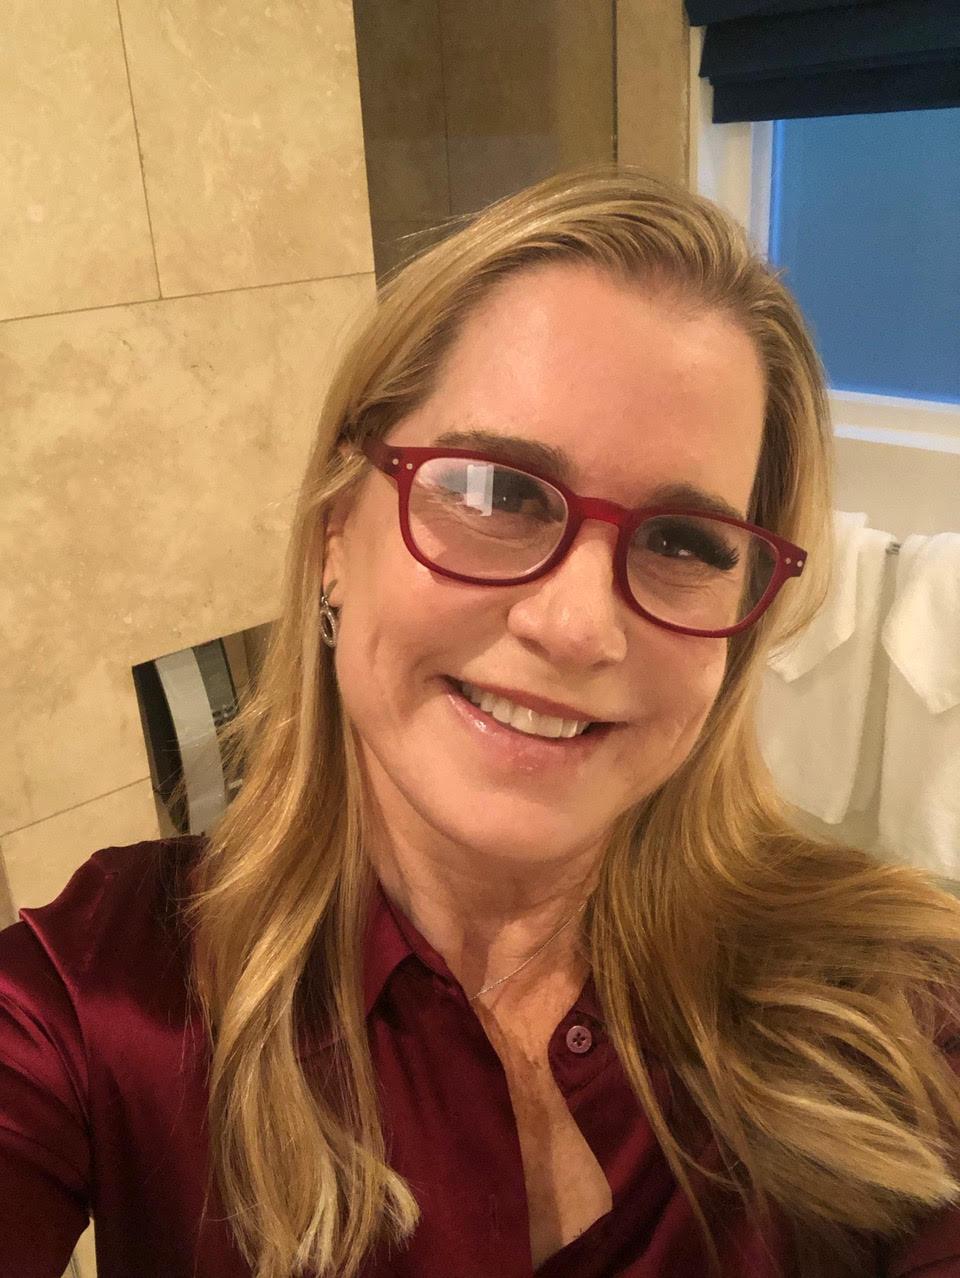 Emily Zolten Jillette